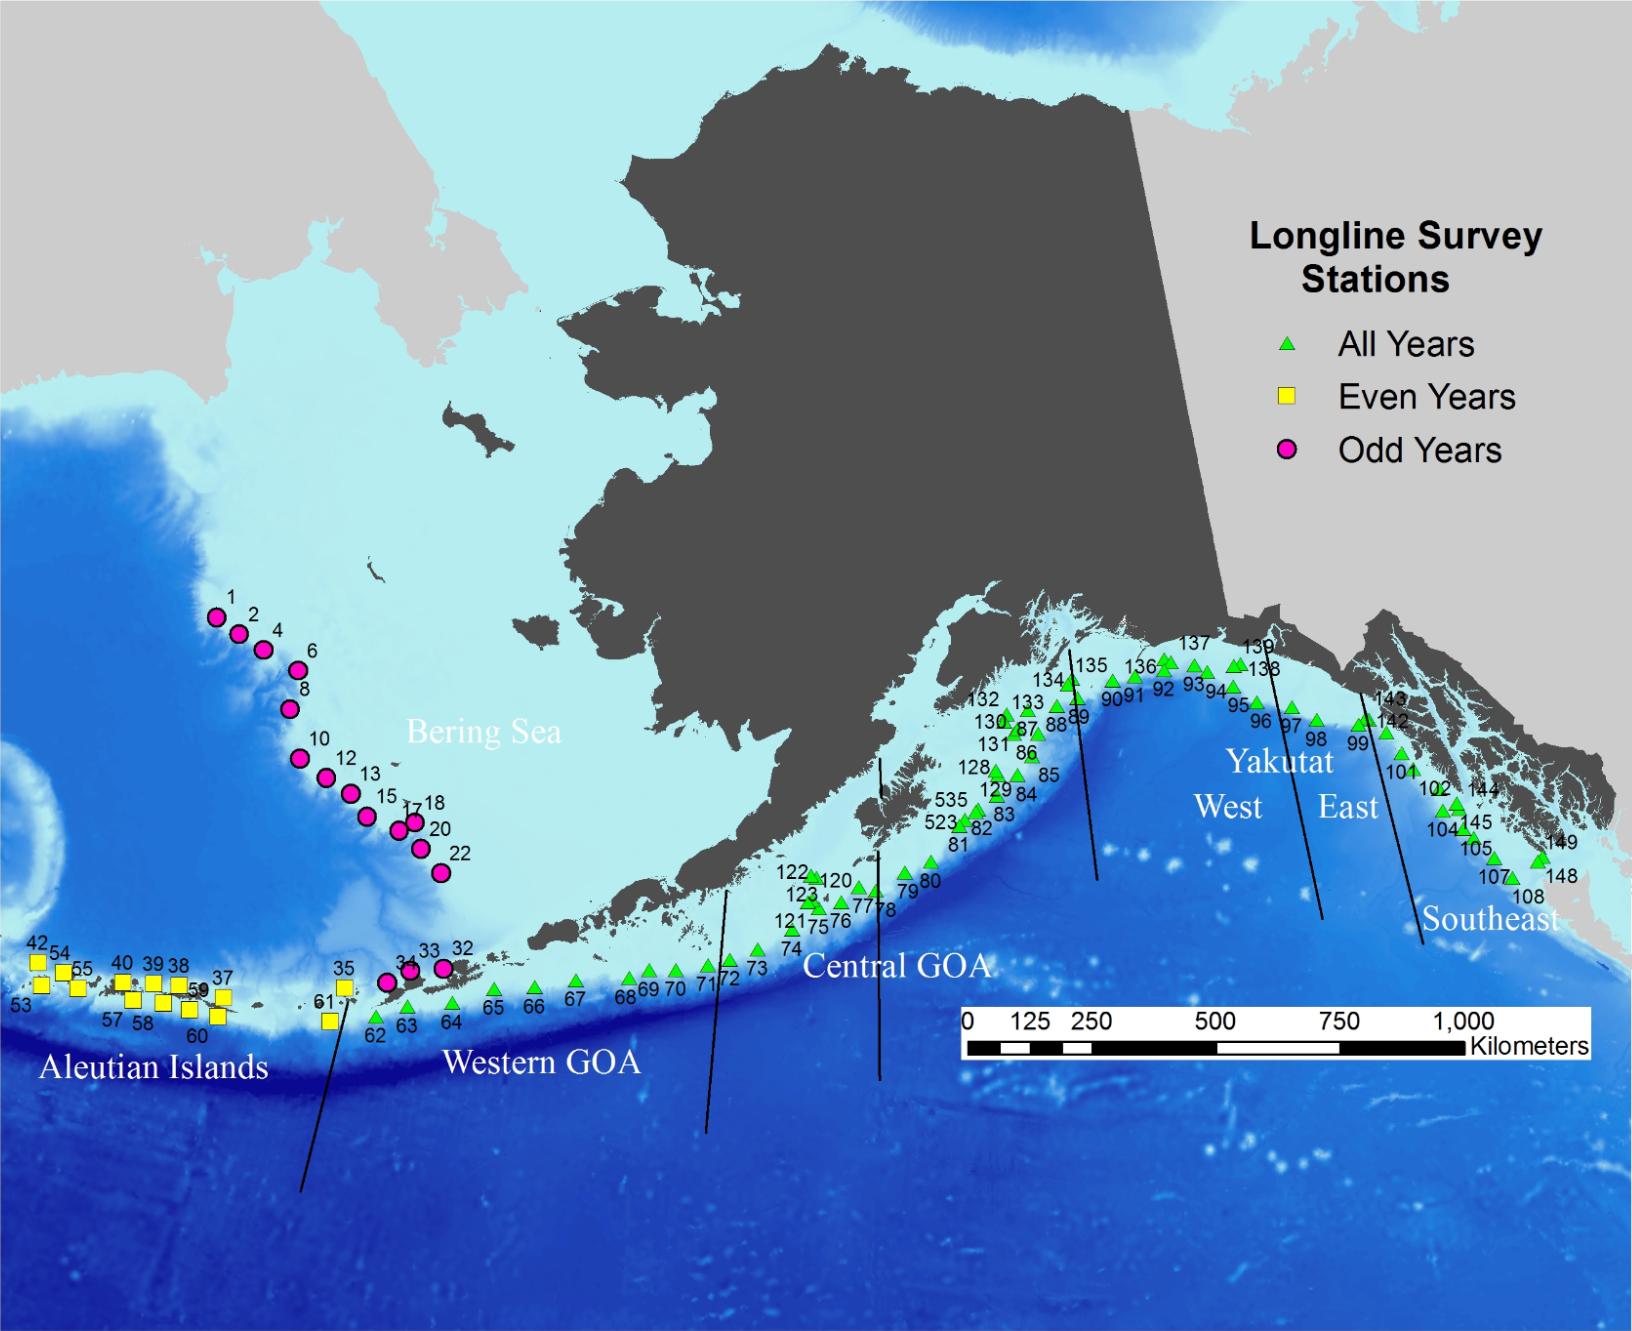 Map of longline survey stations in Alaska.